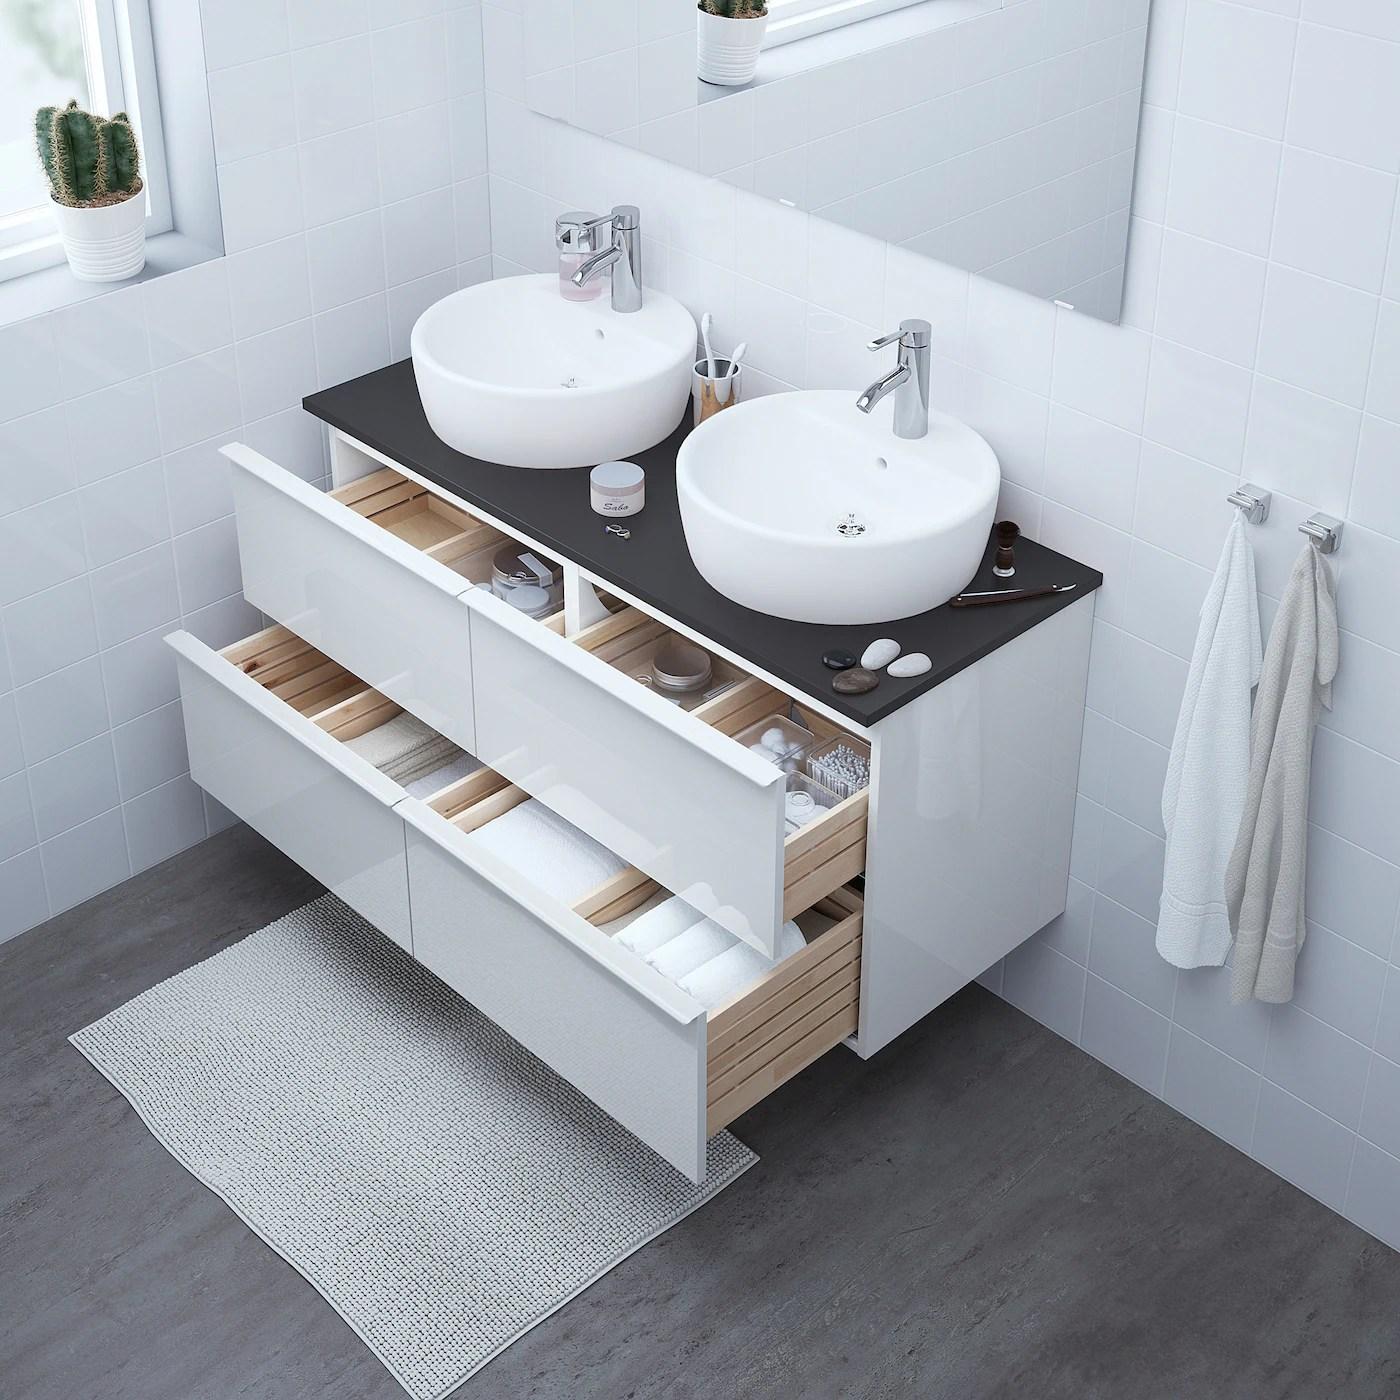 Godmorgon Meuble Pour Lavabo 4 Tiroirs Ultrabrillant Blanc 120x47x58cm Site Web Officiel Ikea